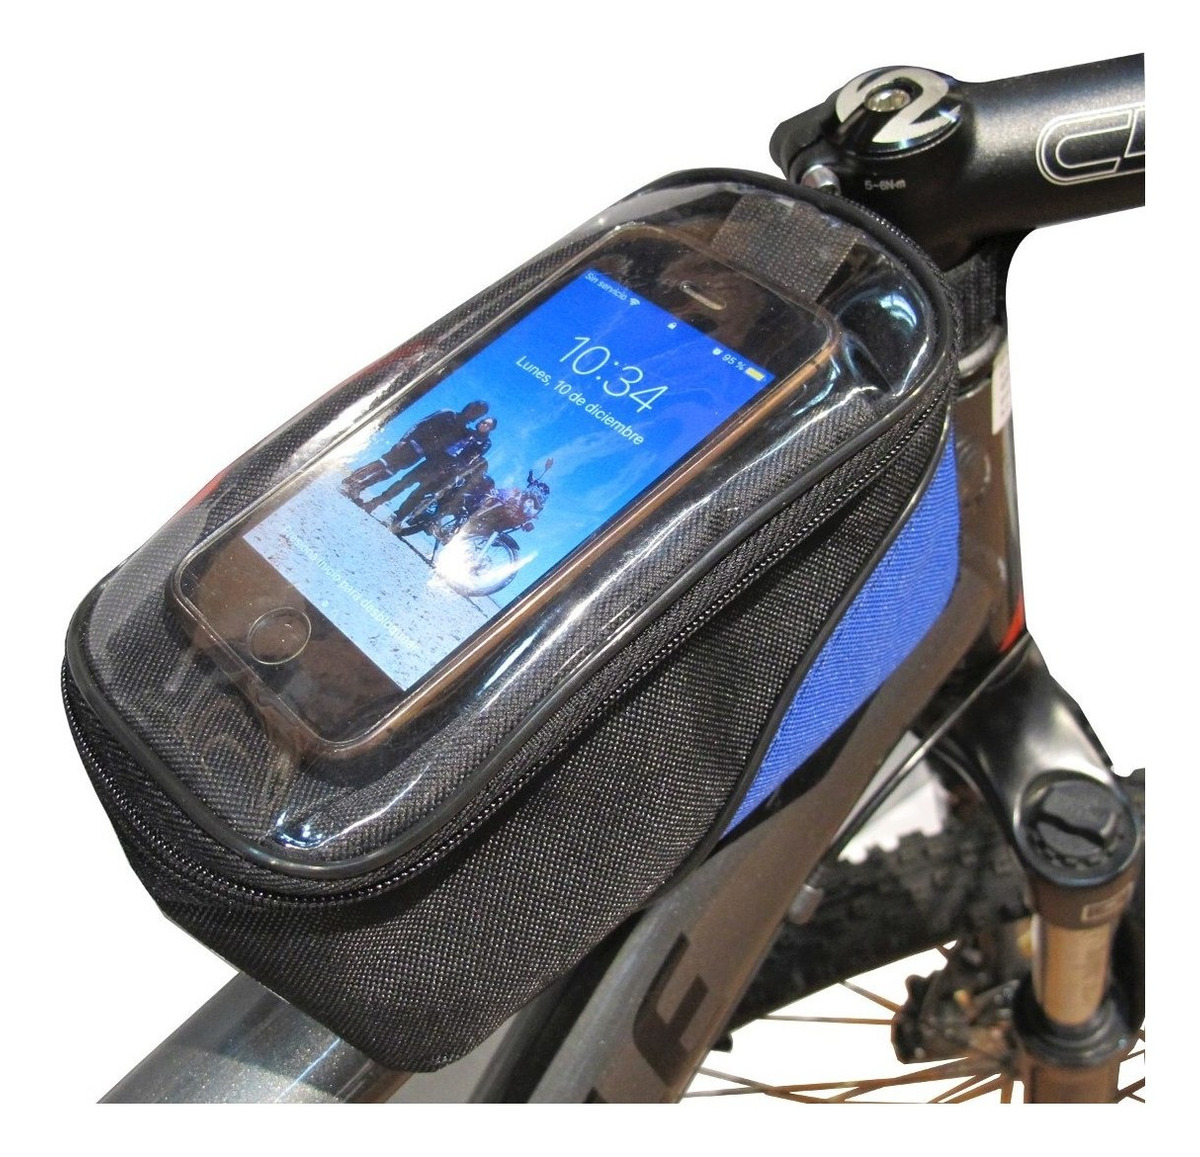 94238e34fc6 Bolso Porta Celular Bicicleta Smartphone Sl Visor Tactil - $ 399,99 ...